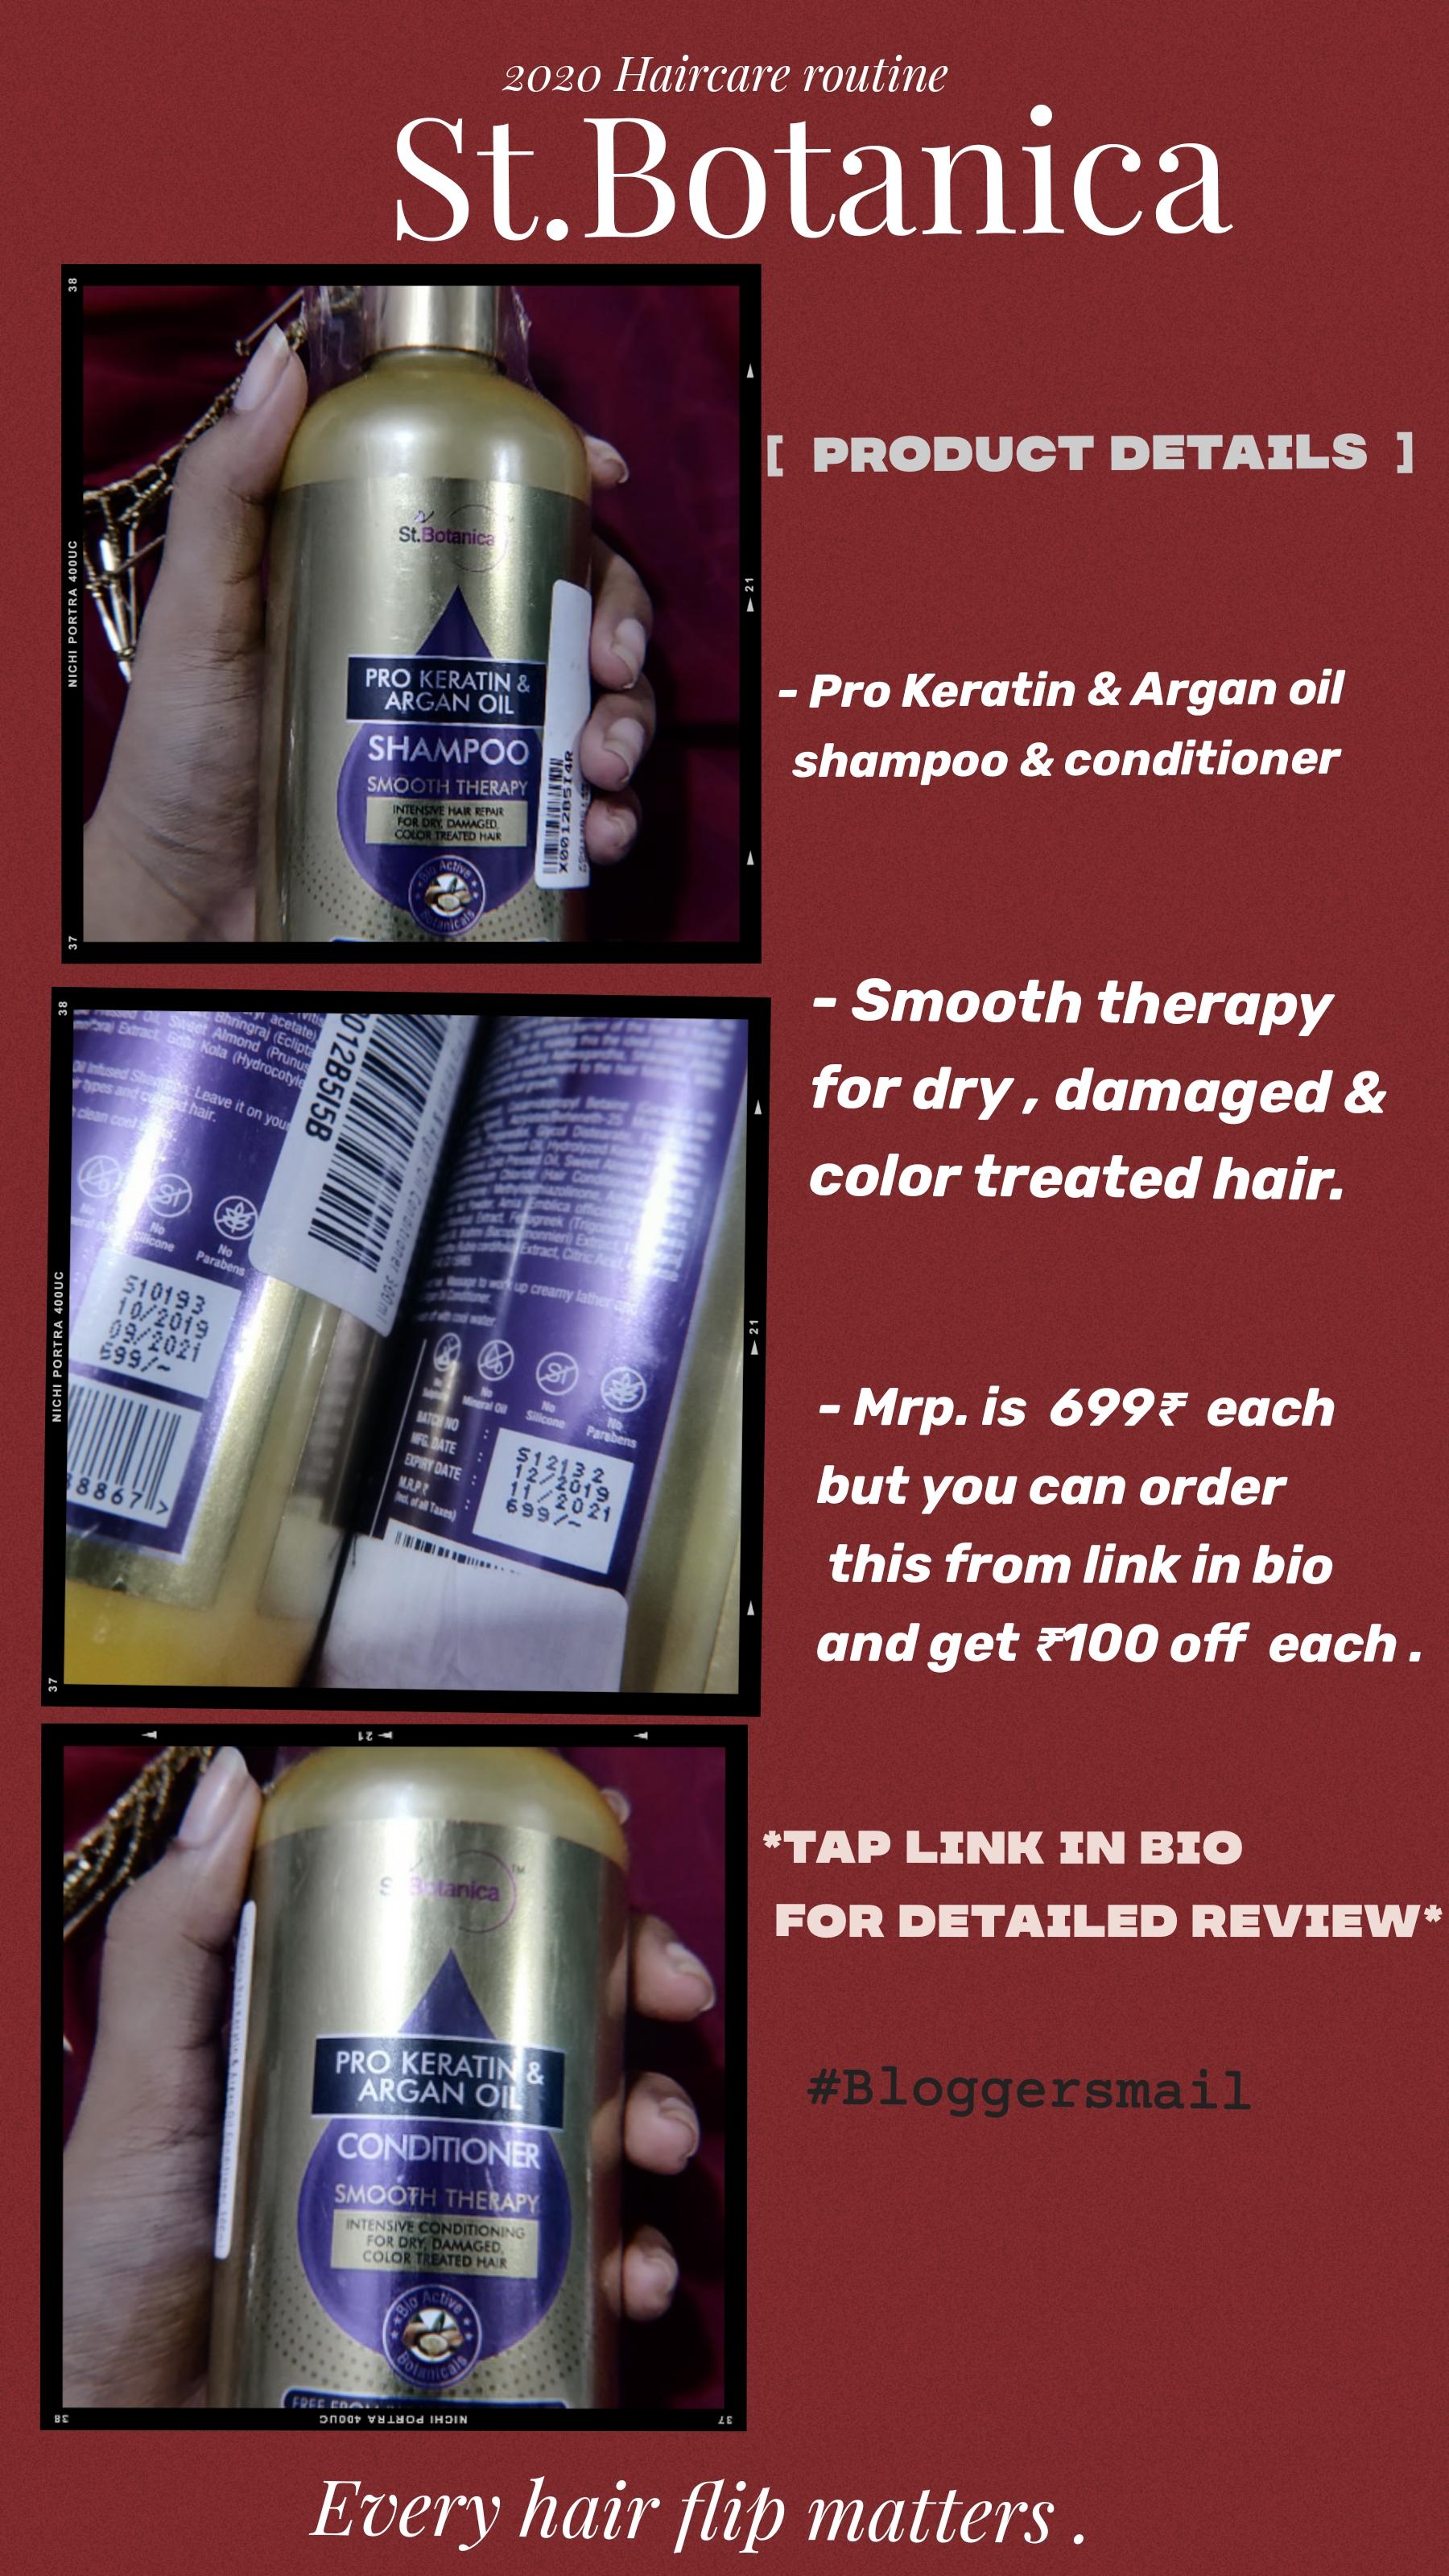 St.Botanica Pro Keratin & Argan Oil Shampoo-Average shampoo-By vaishvita-1